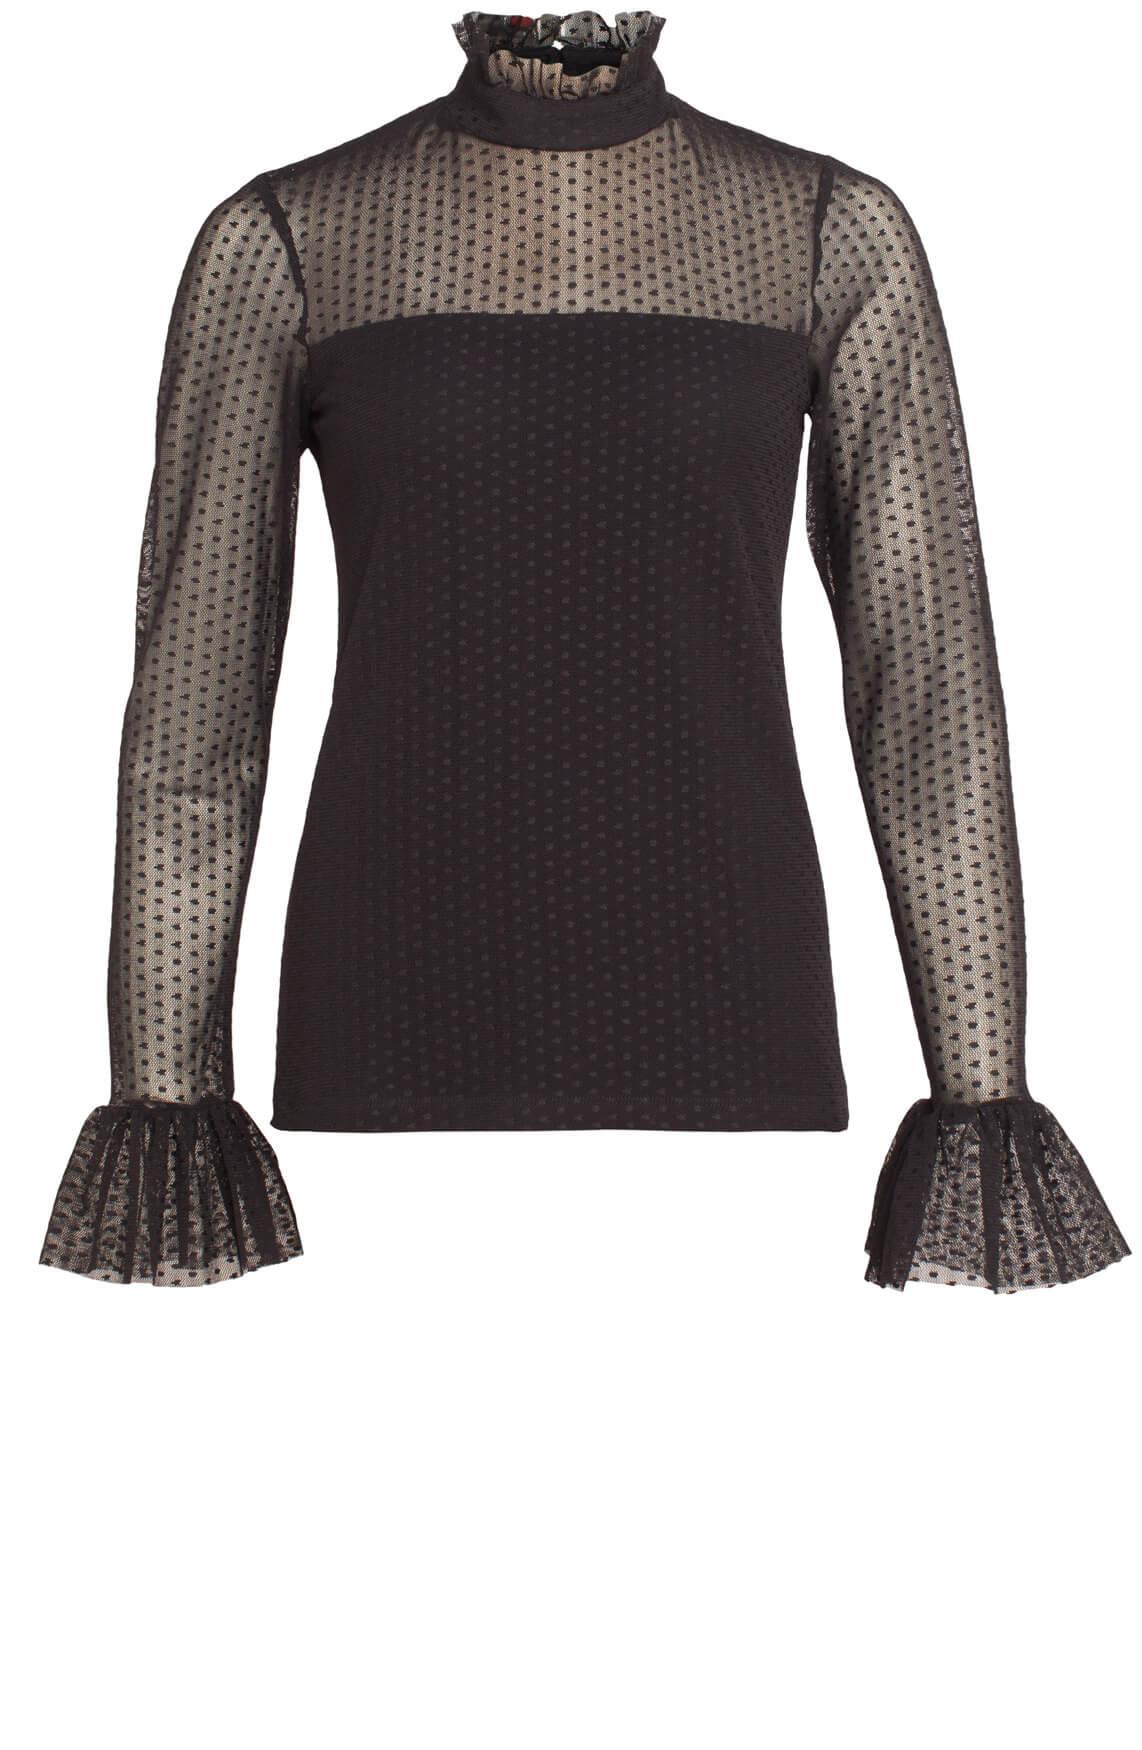 Jane Lushka Dames Mesh blouse met stippen zwart